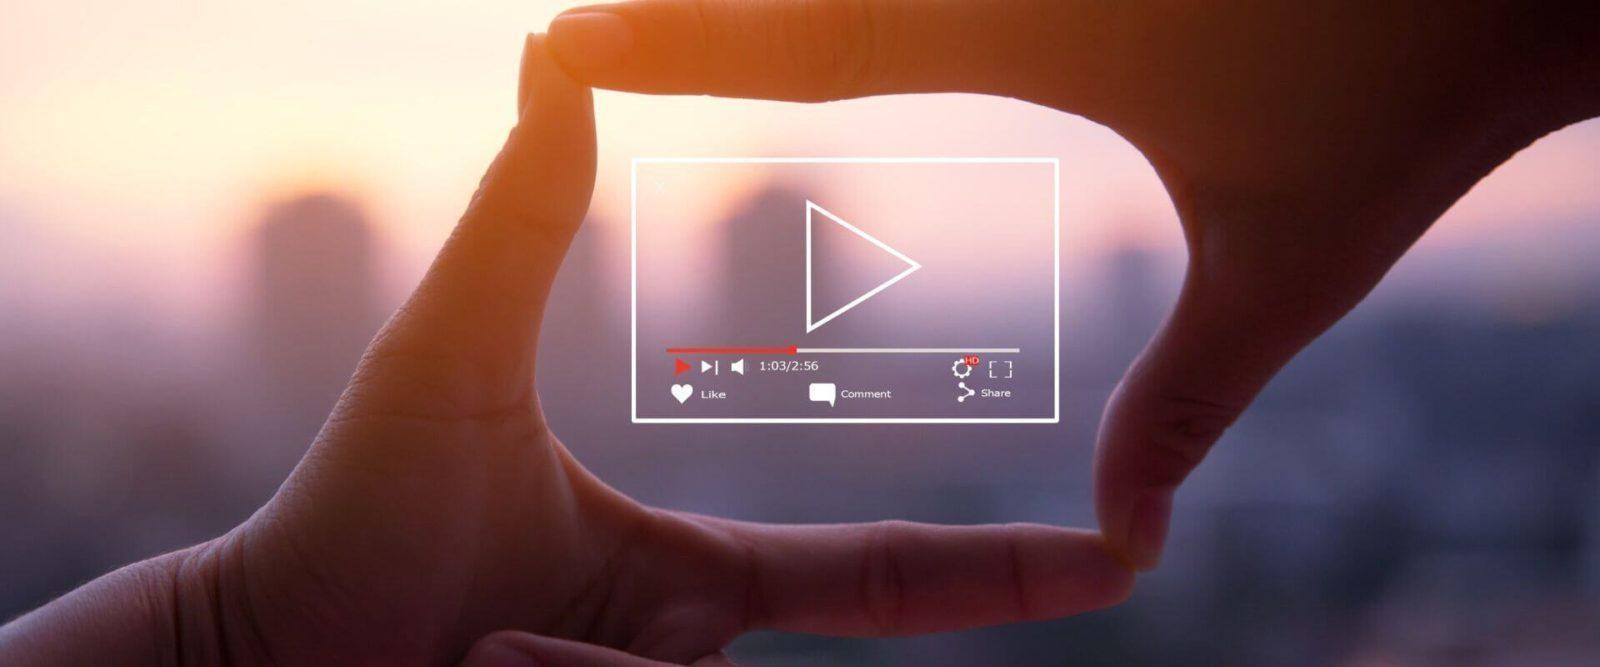 buying youtube views to make money